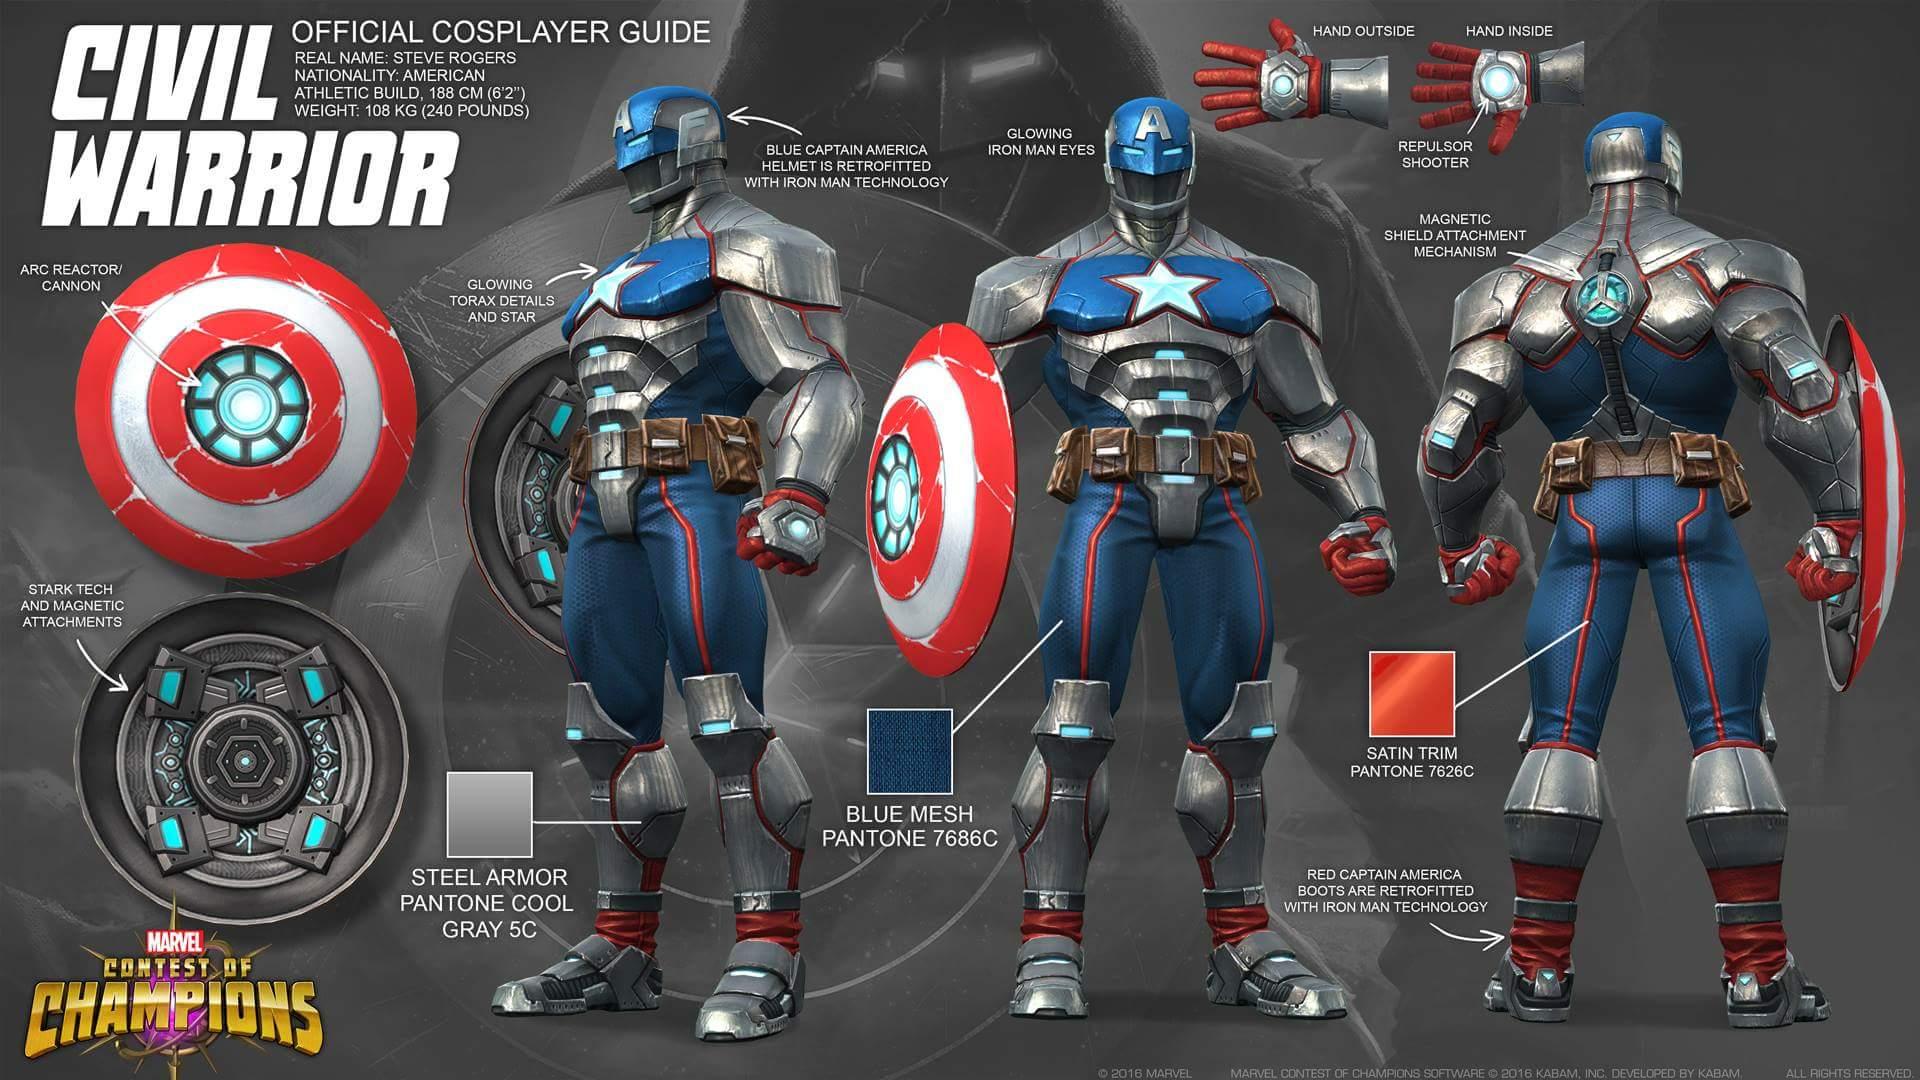 Civil Warrior Armor/Gallery